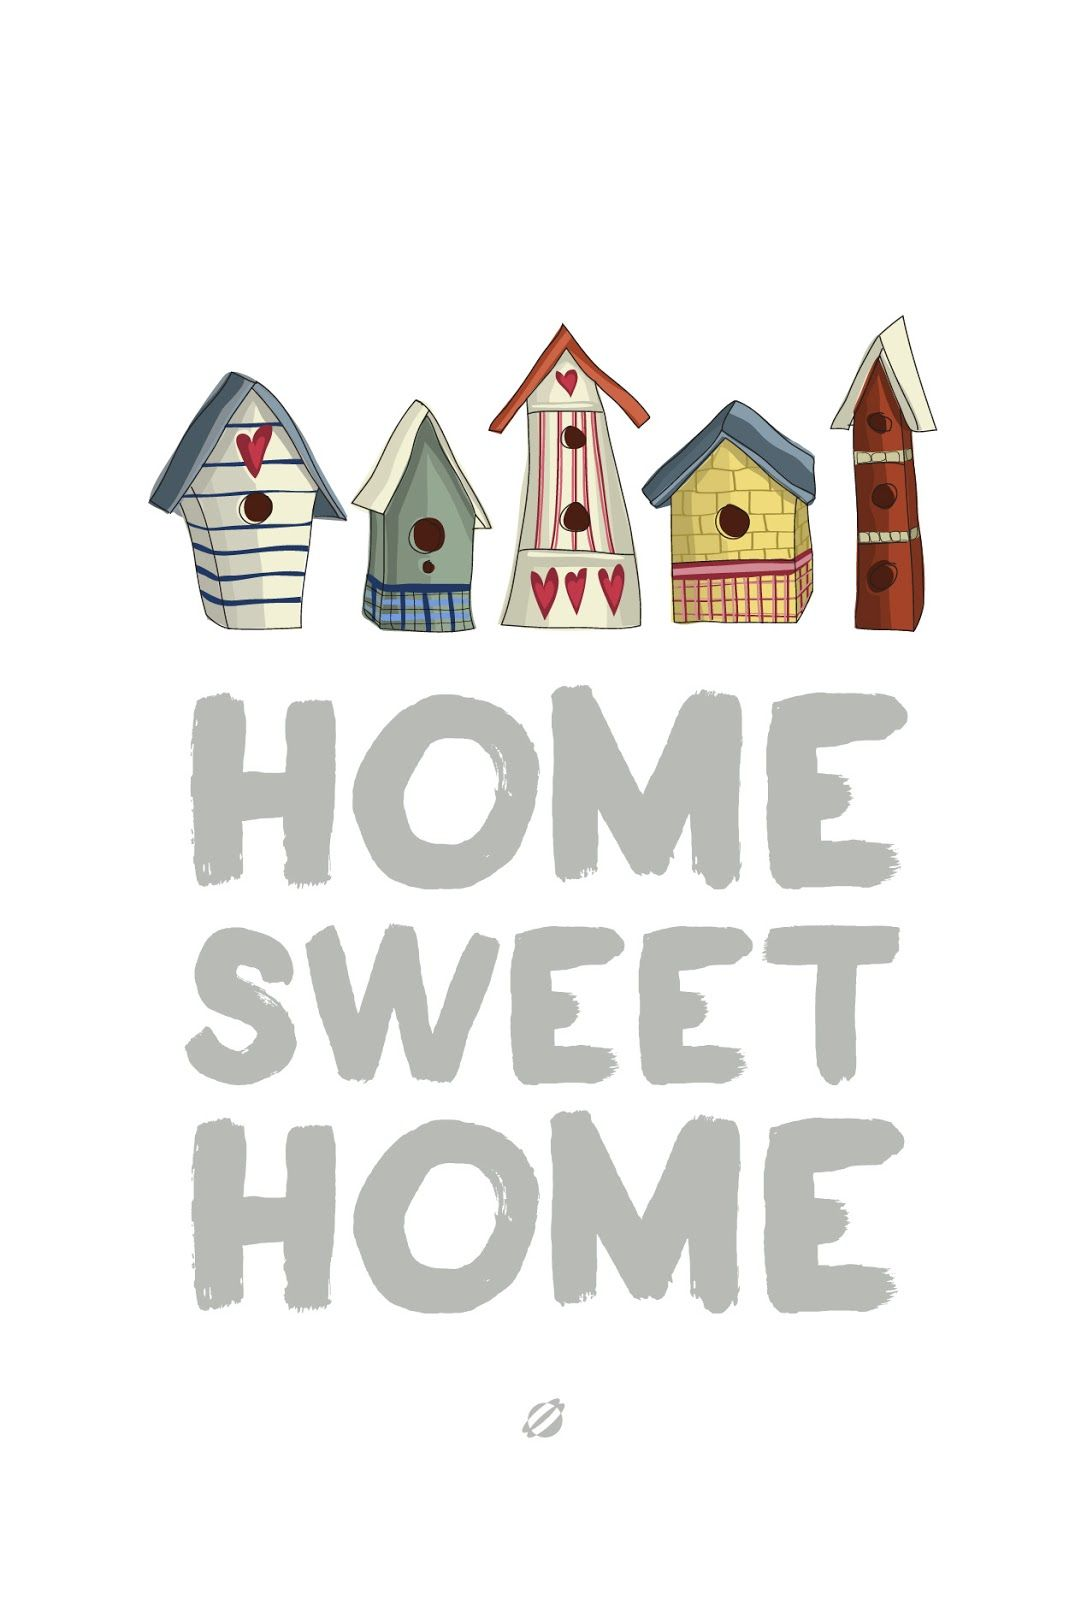 Lostbumblebee Home Sweet Home Home Sweet Home Images Sweet Home Free Wall Art